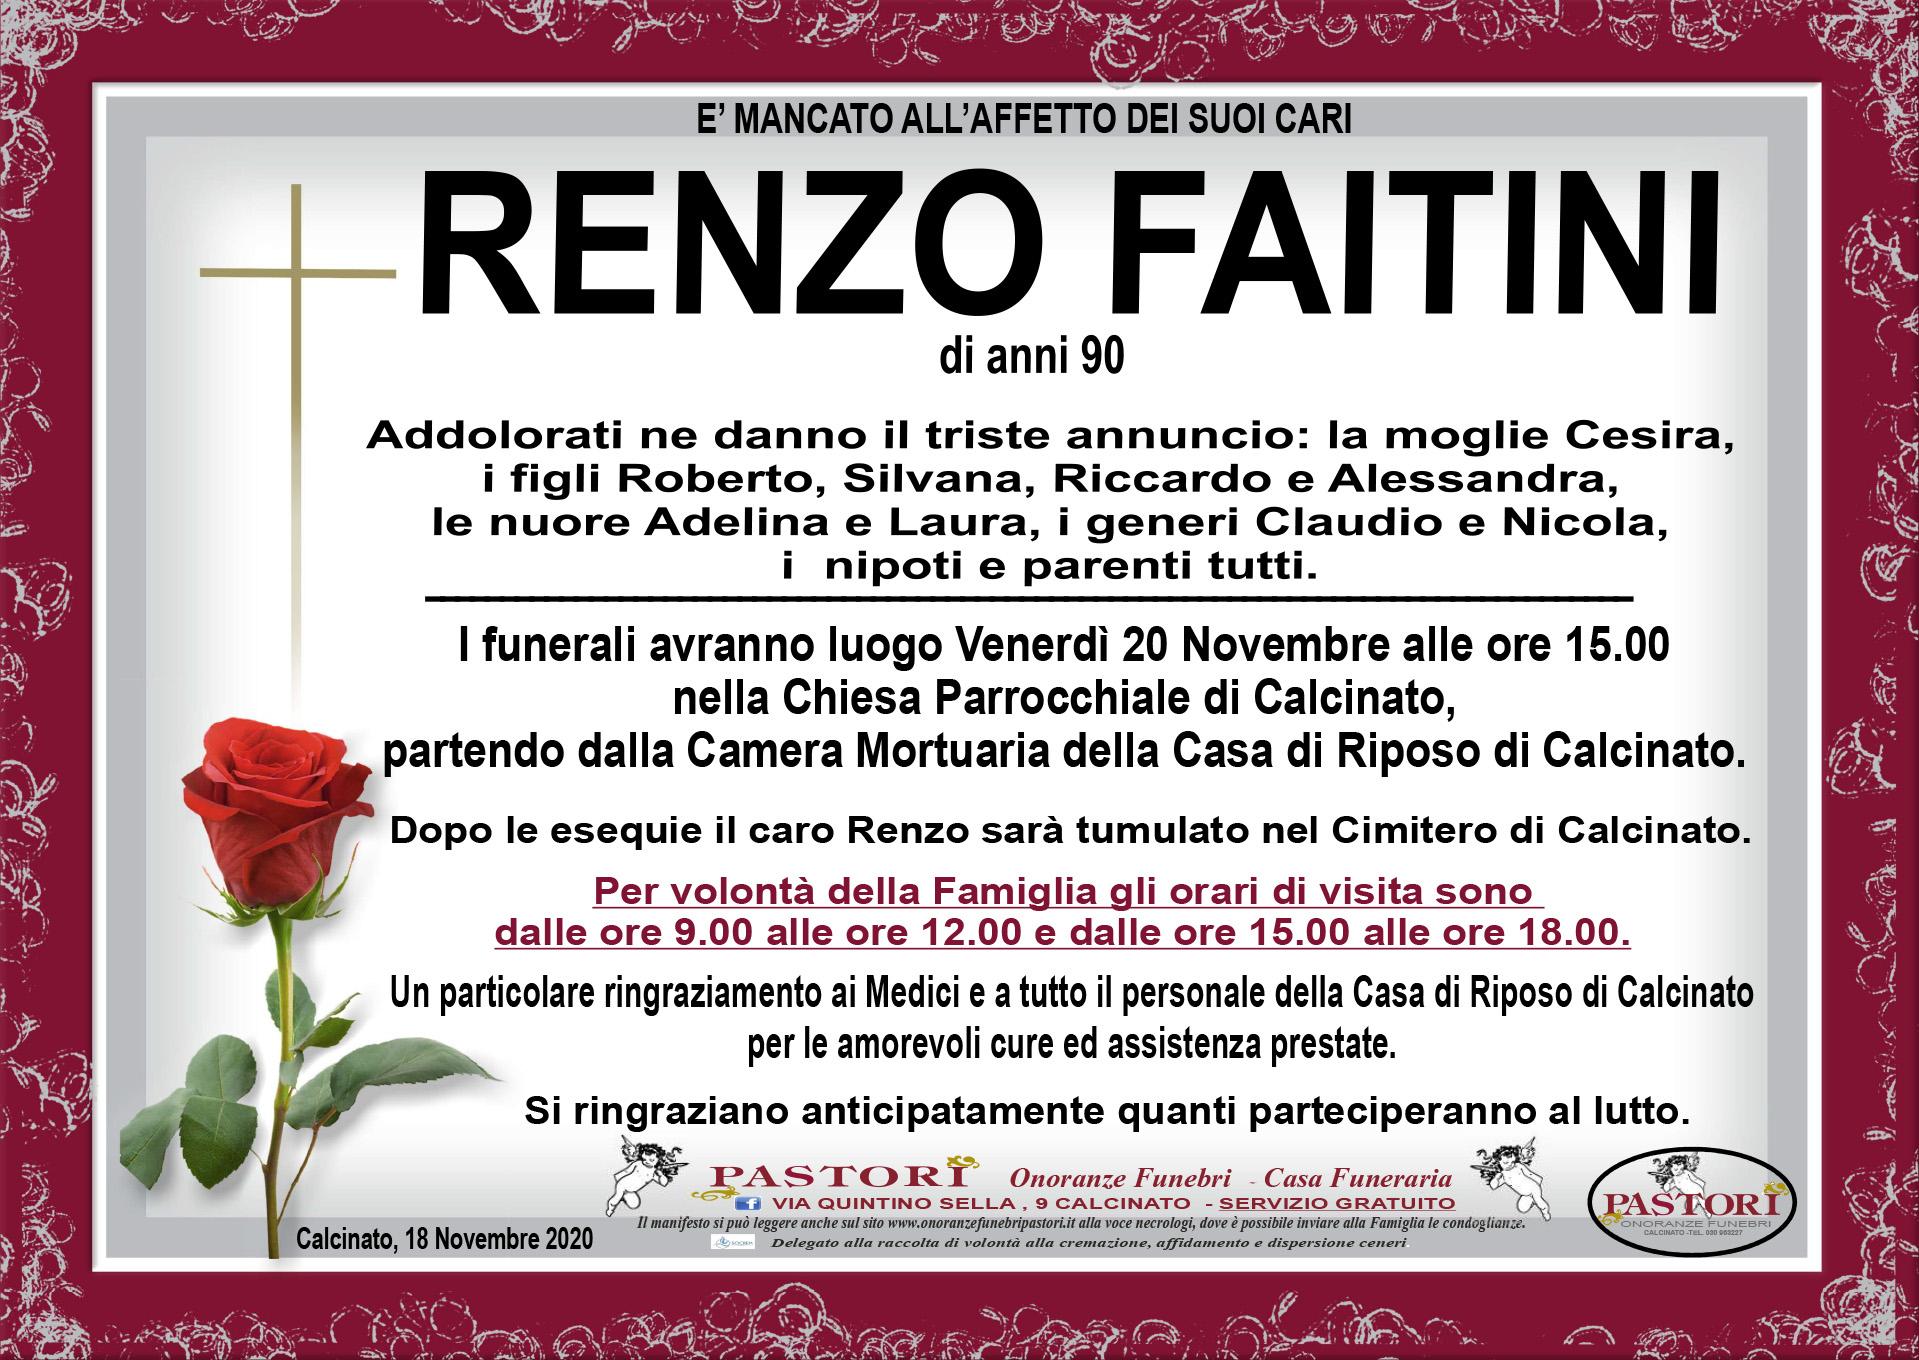 Renzo Faitini